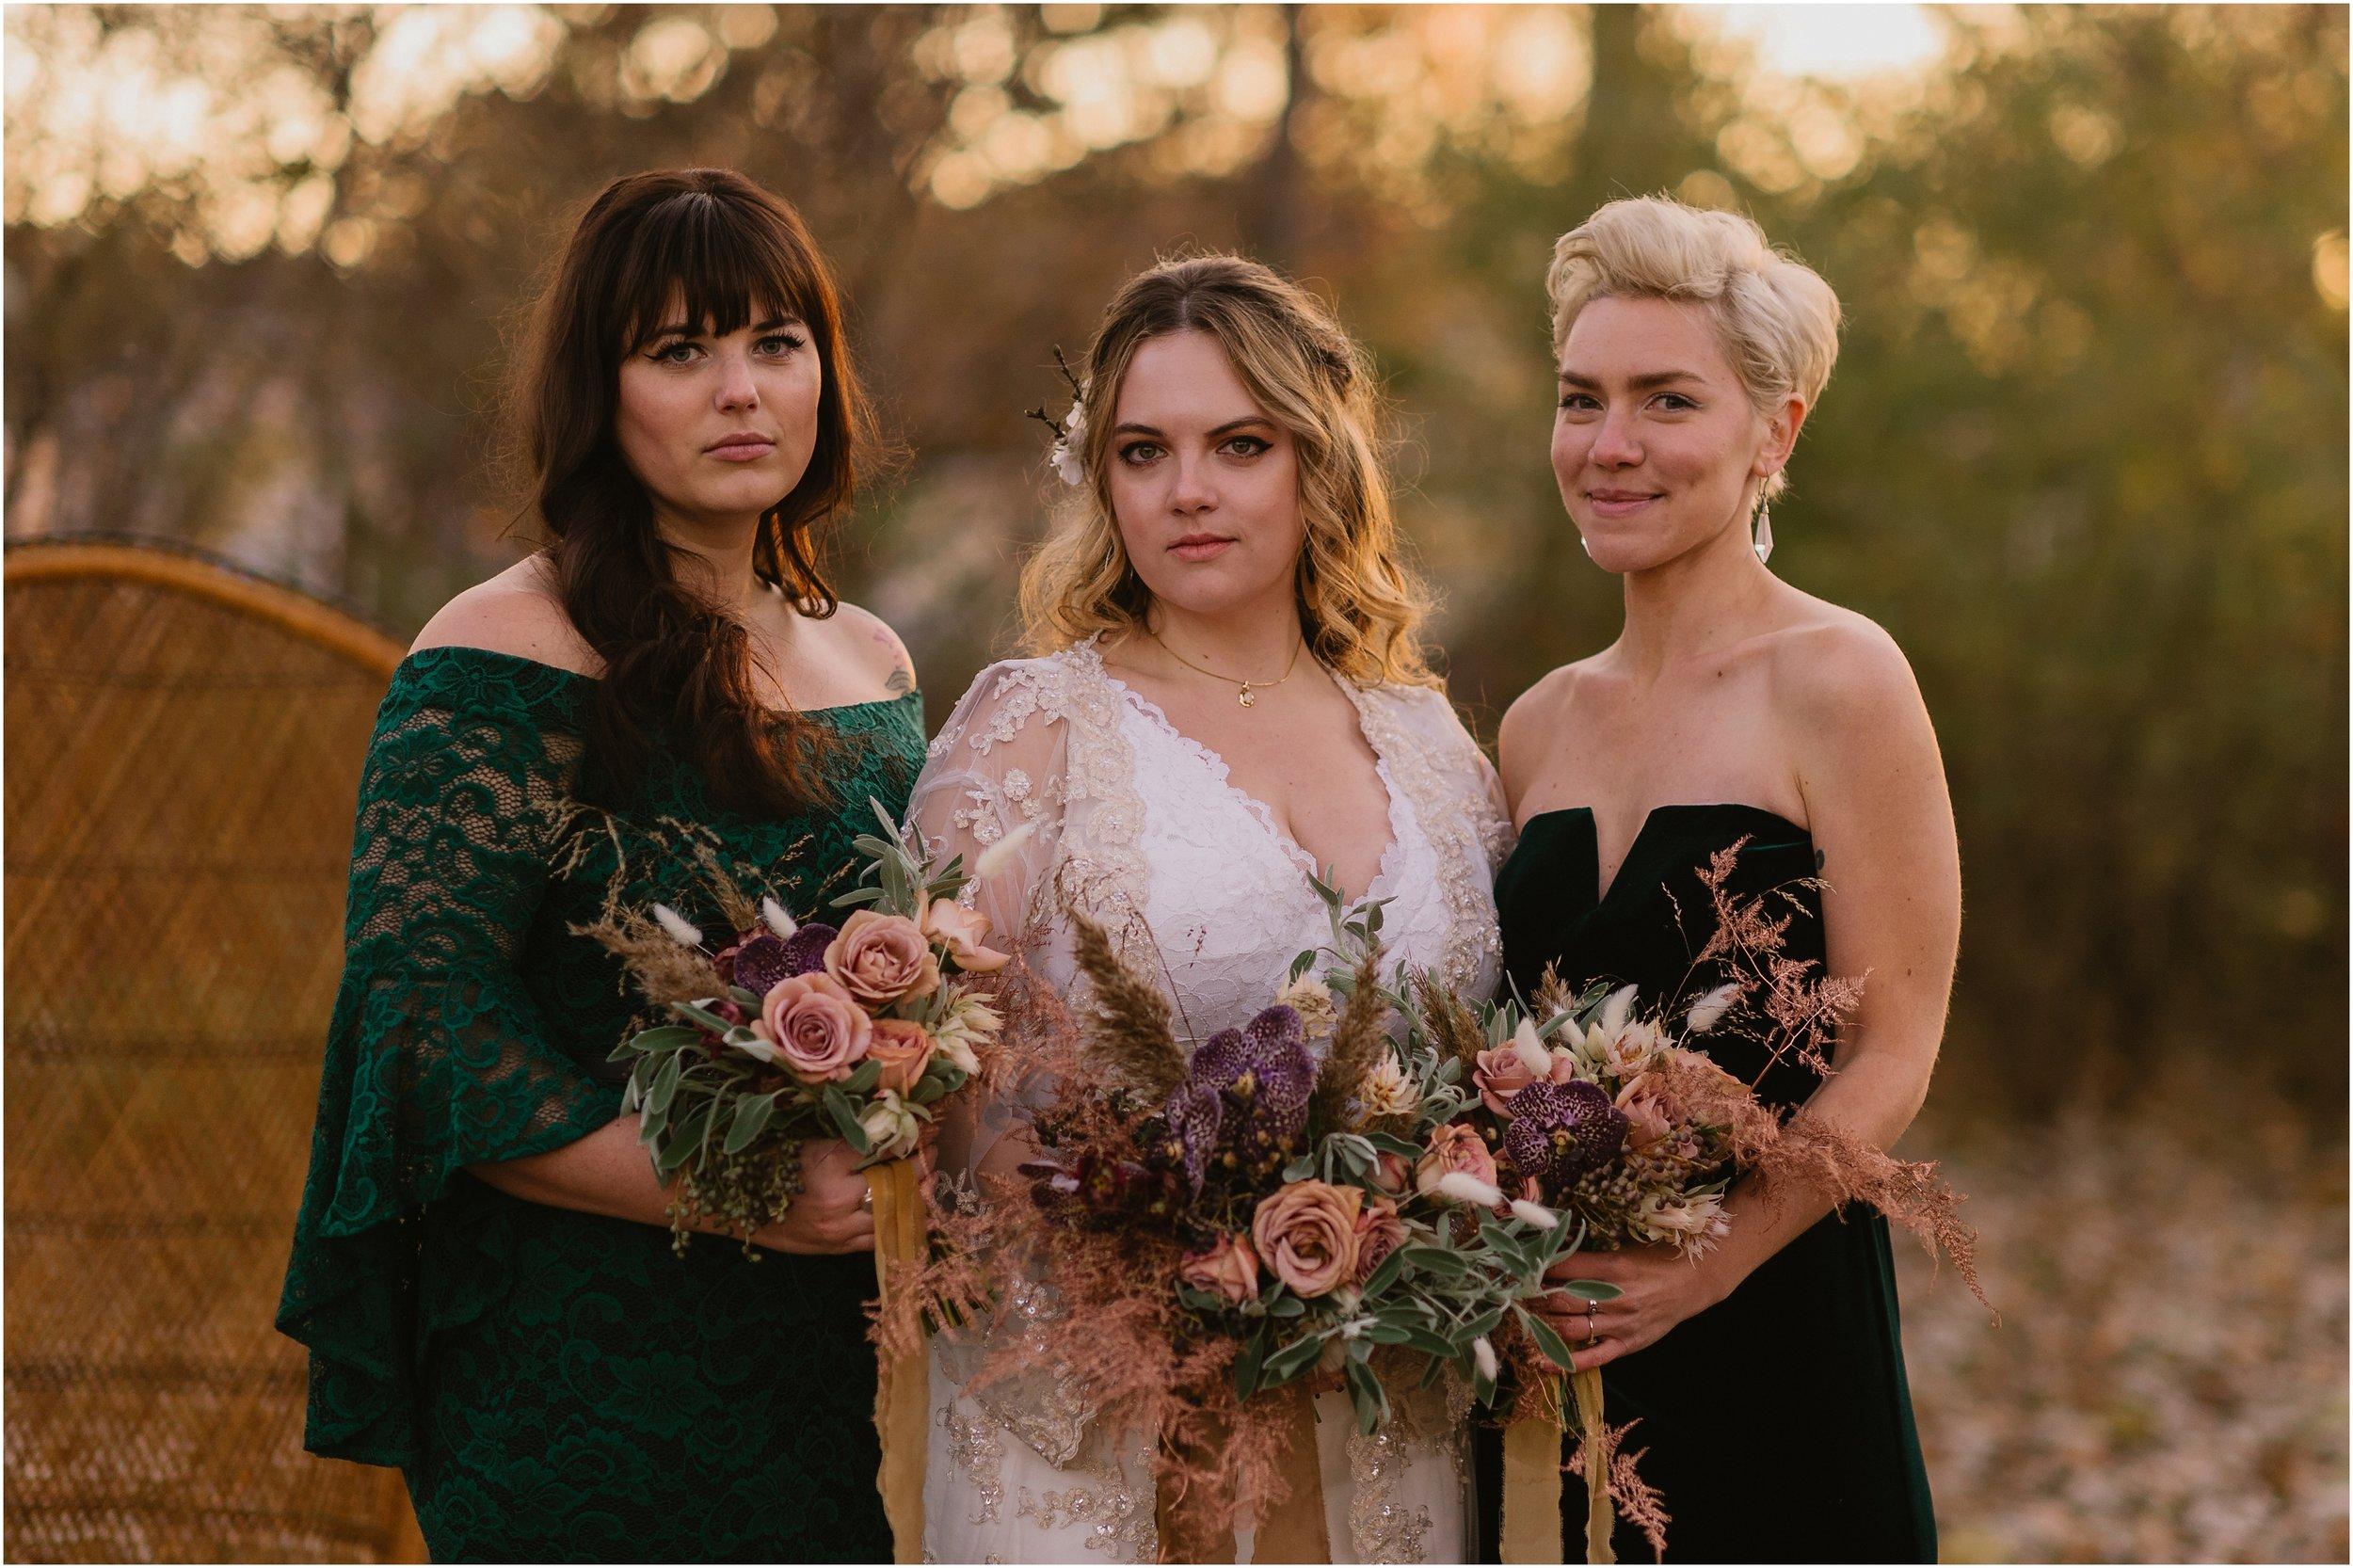 Rebecca_Shehorn_Photography_Indianapolis_Wedding_Photographer_9439.jpg